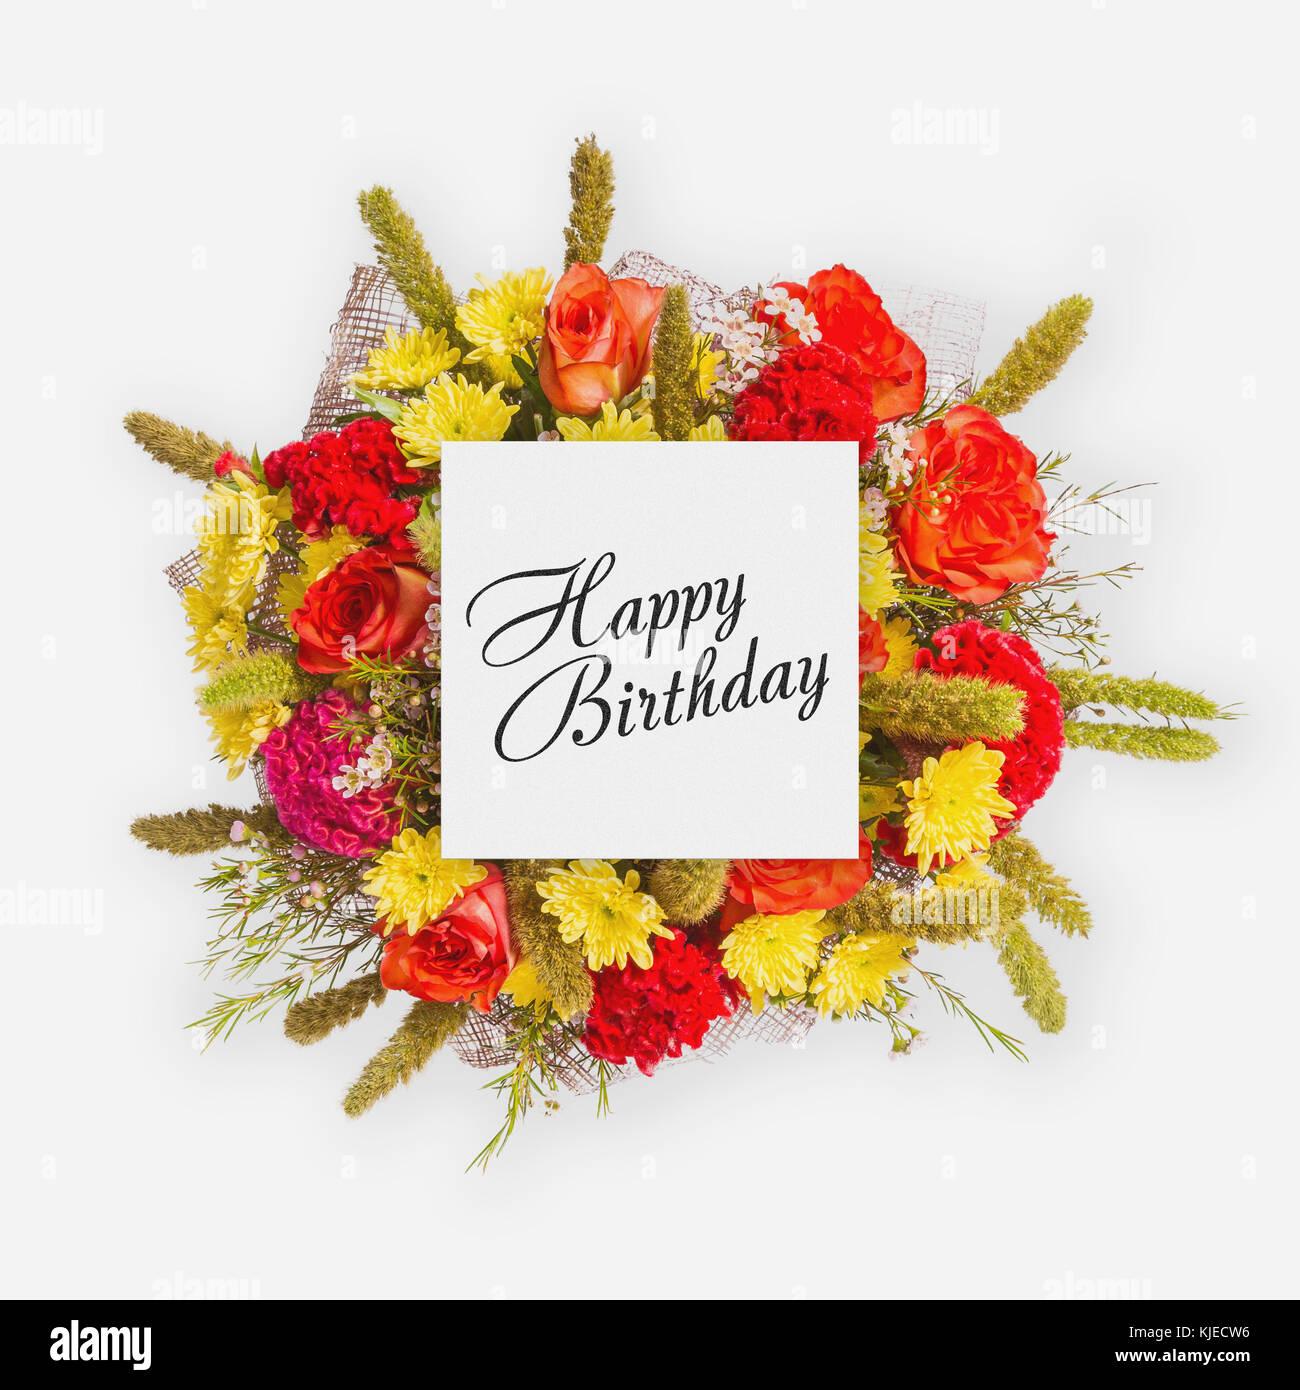 Birthday card with flowers stock photos birthday card with flowers happy birthday card with flowers flat lay stock image izmirmasajfo